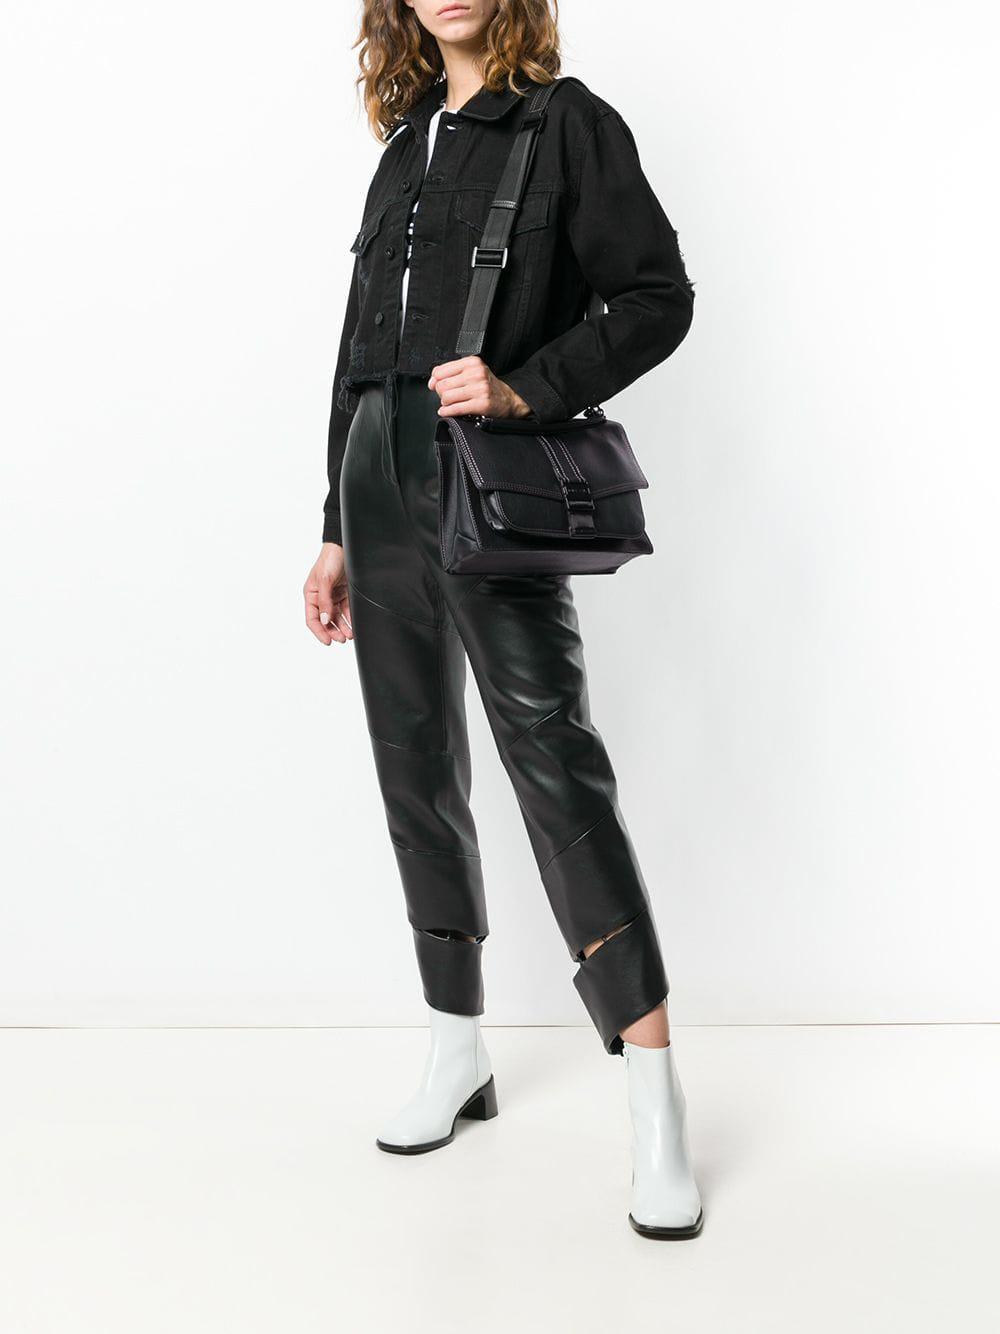 7123fbf0be11 Lyst - DIESEL Miss-match Crossbody Bag in Black